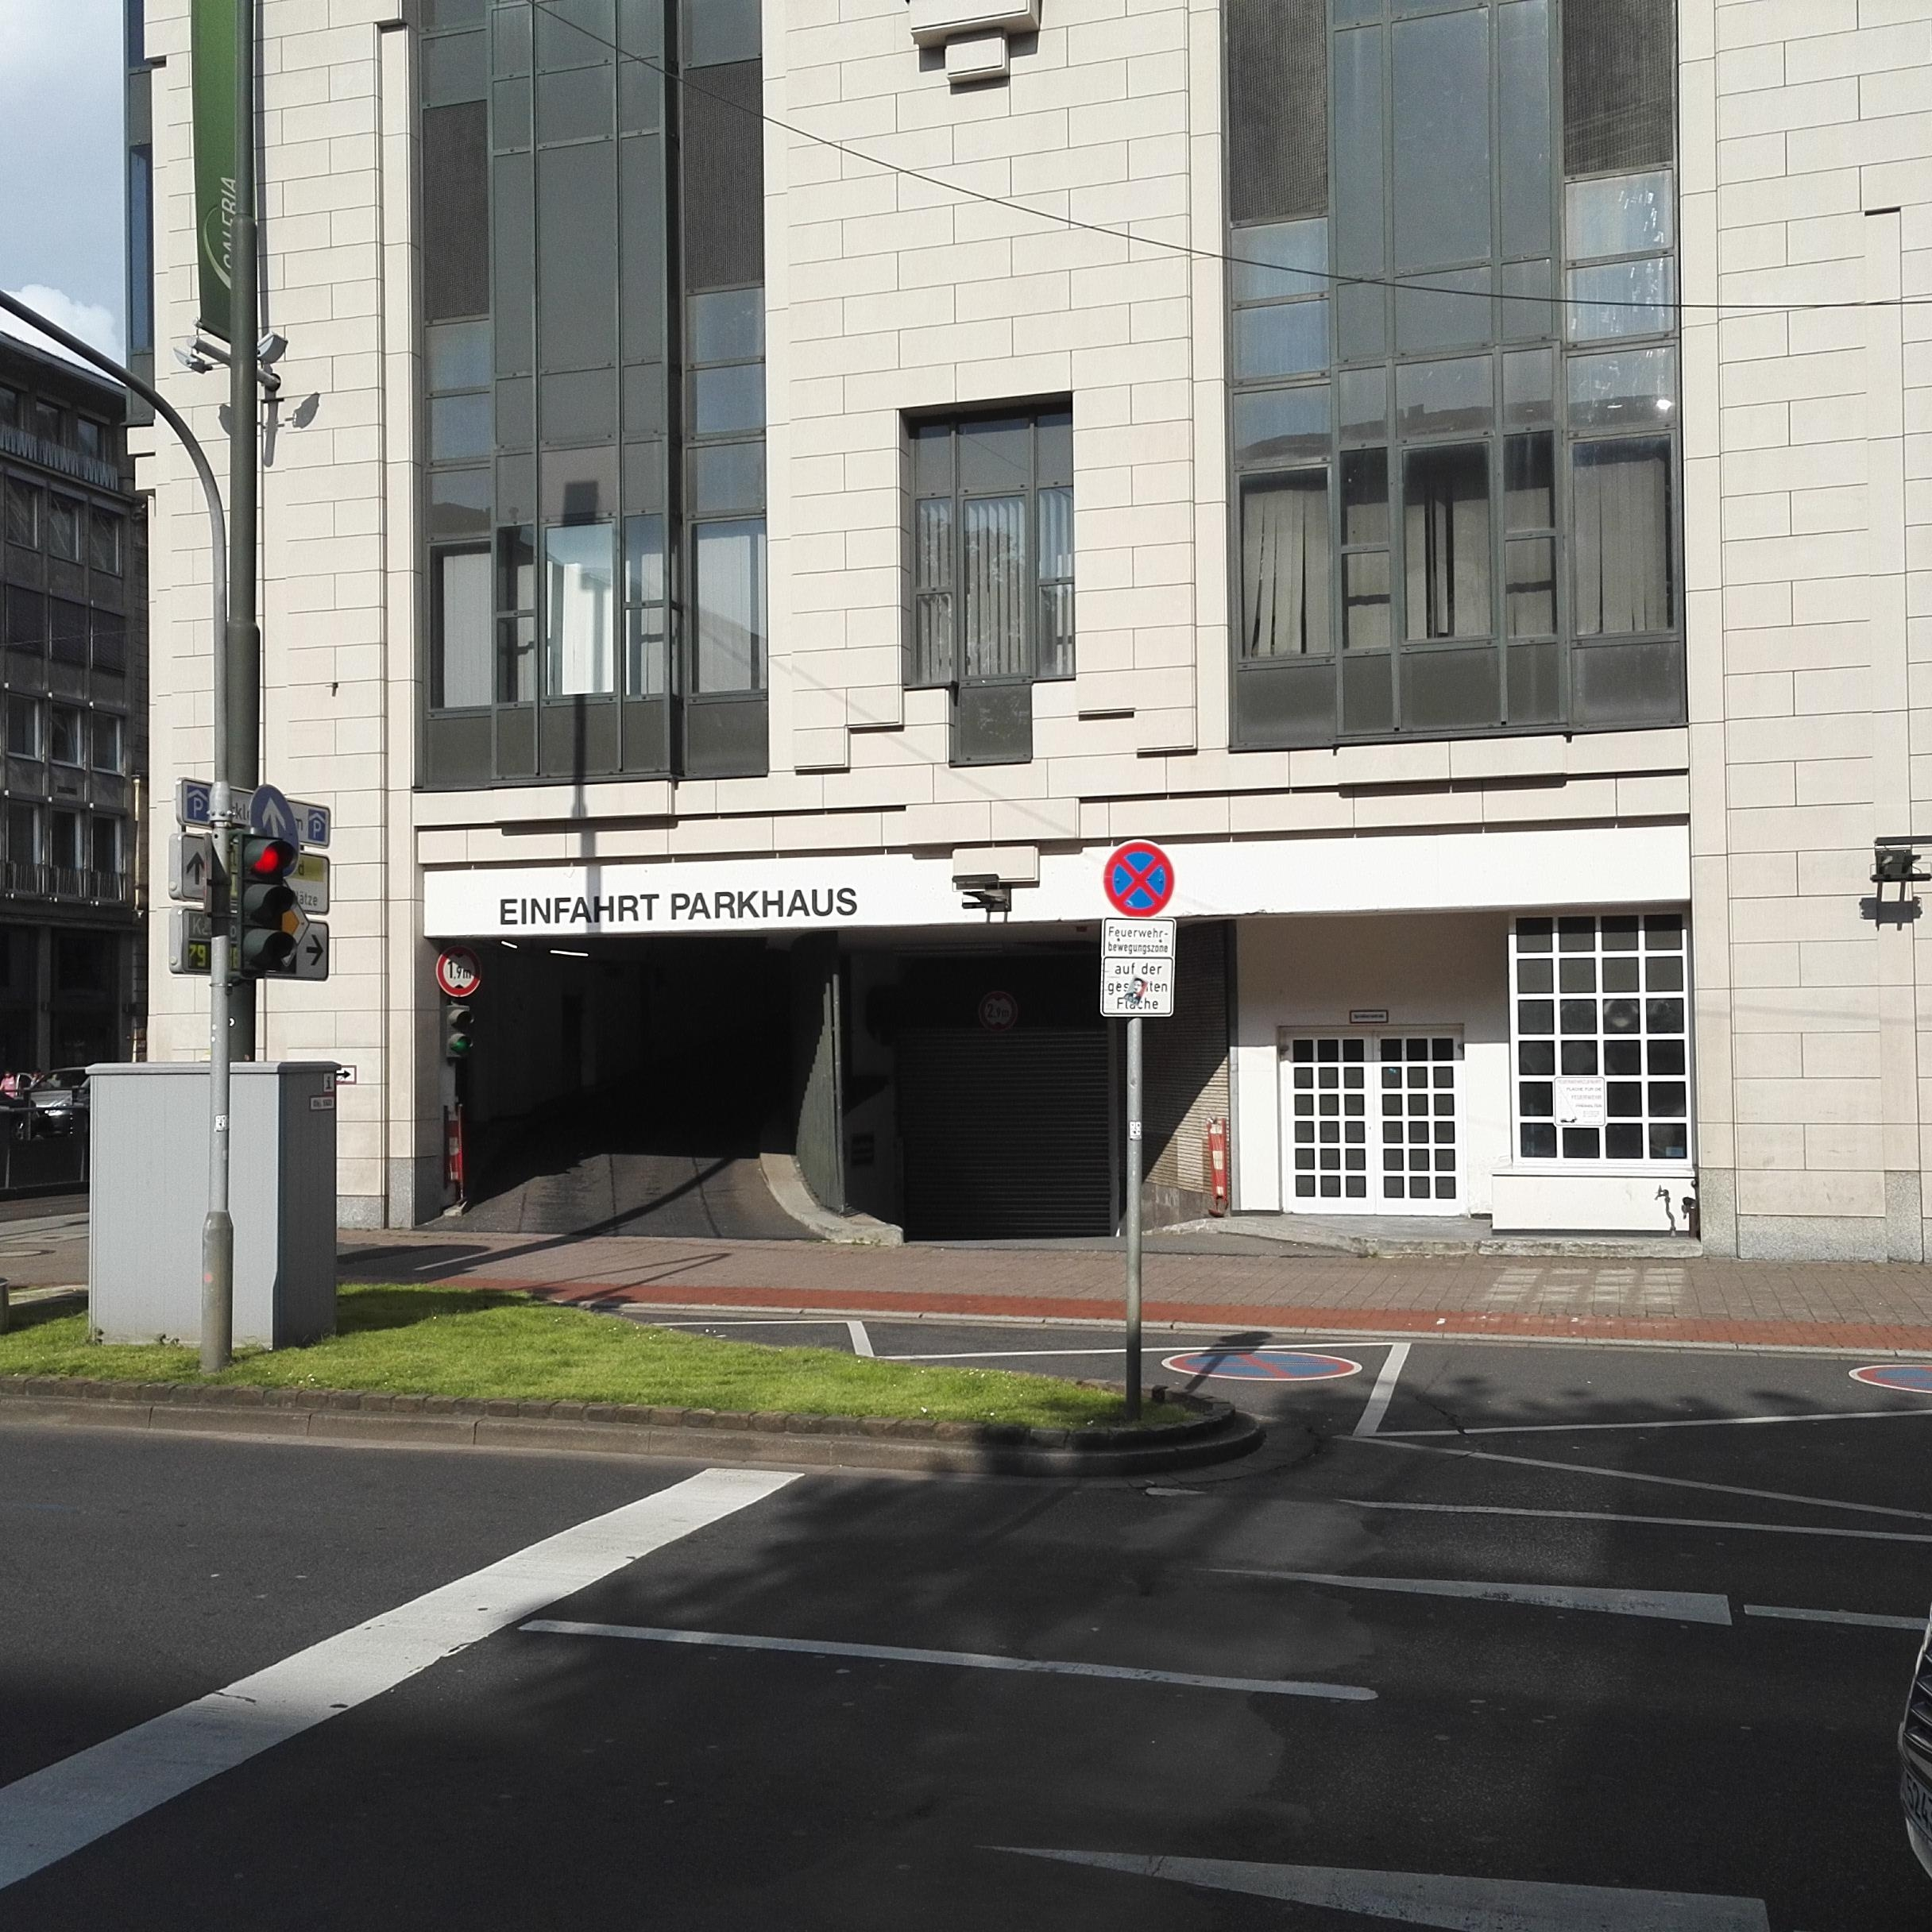 Galeria Kaufhof: Galeria Kaufhof - Parking In Düsseldorf